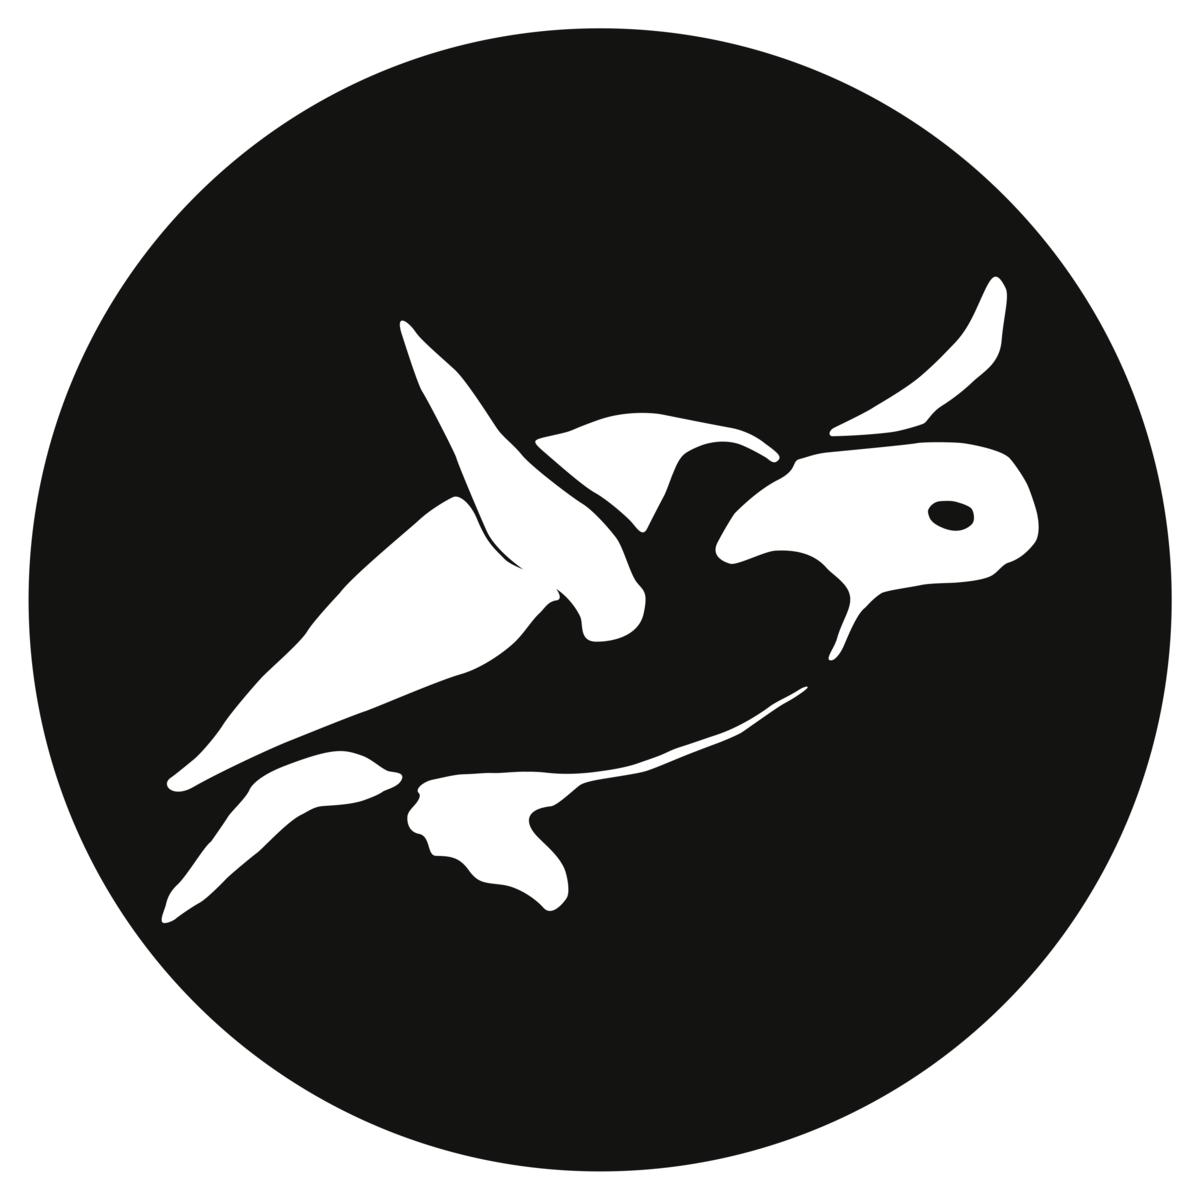 pure planet logo circle icon black